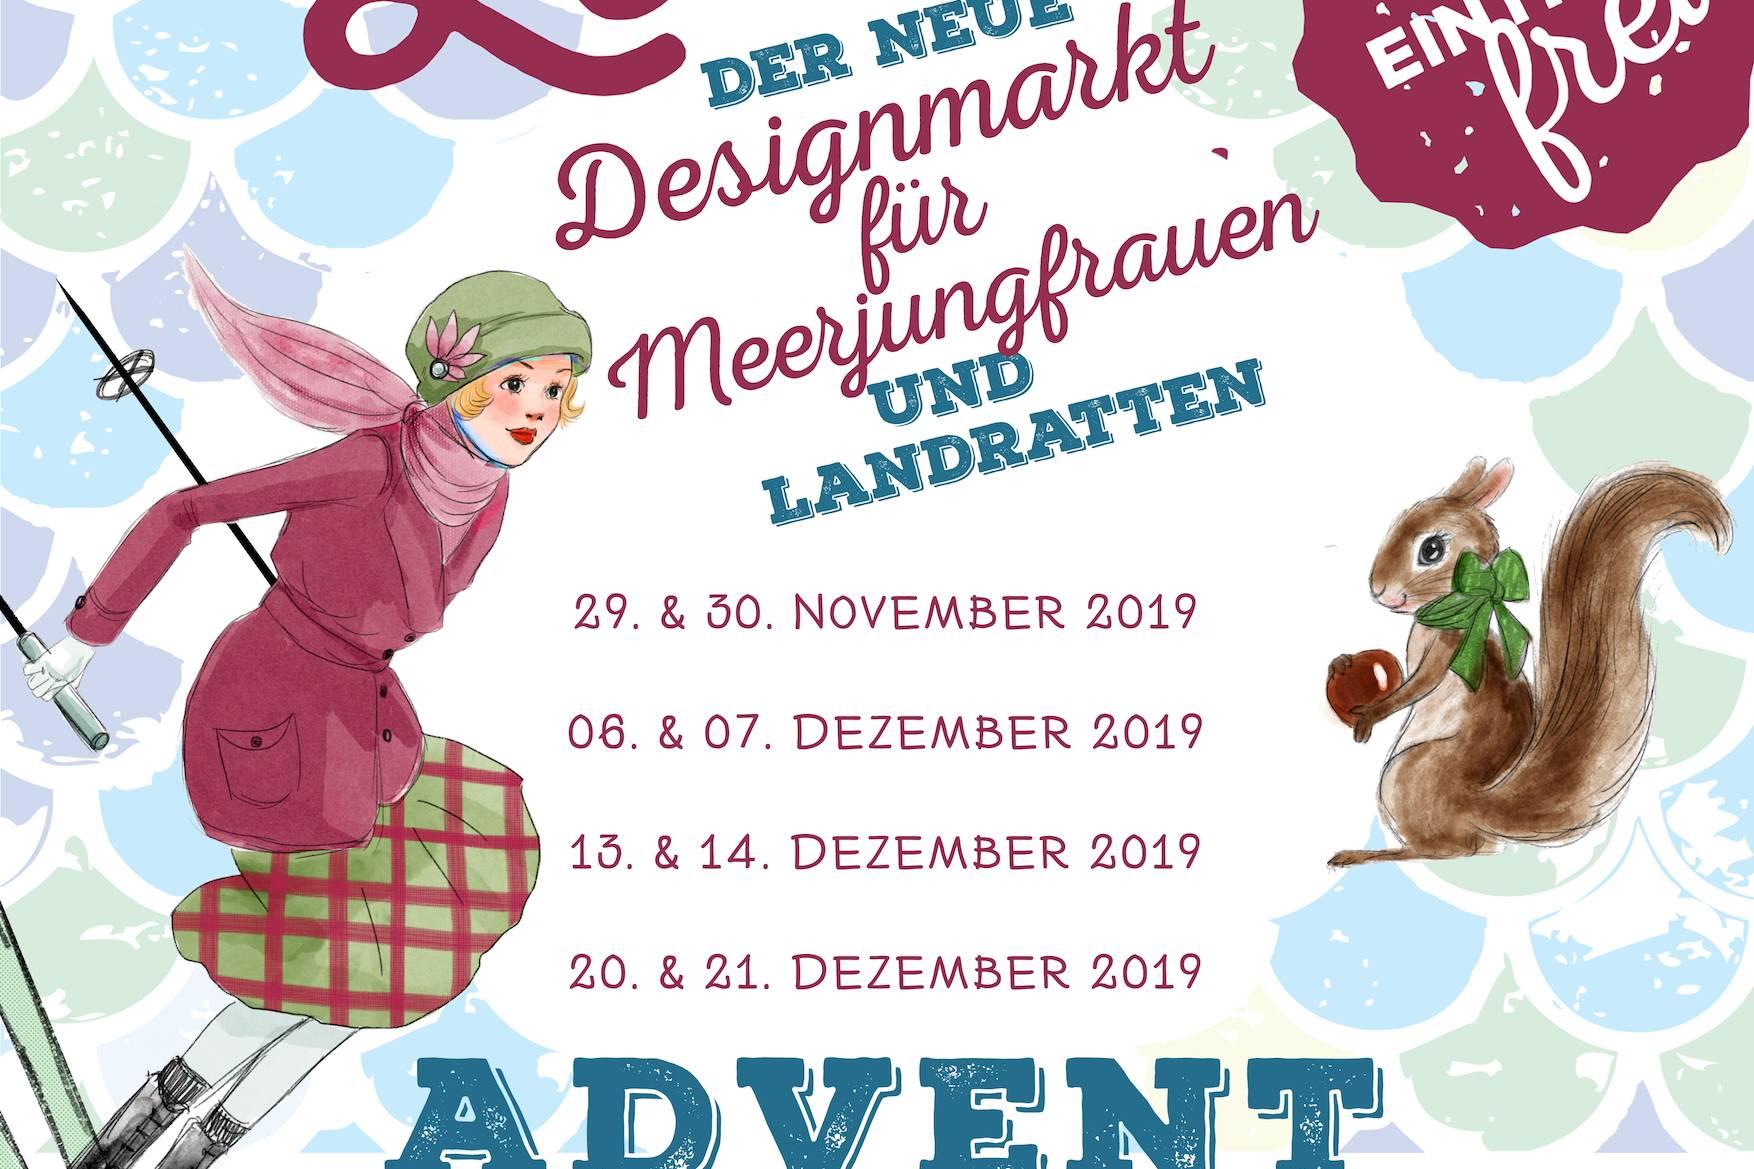 Advent_Designmarkt_festland